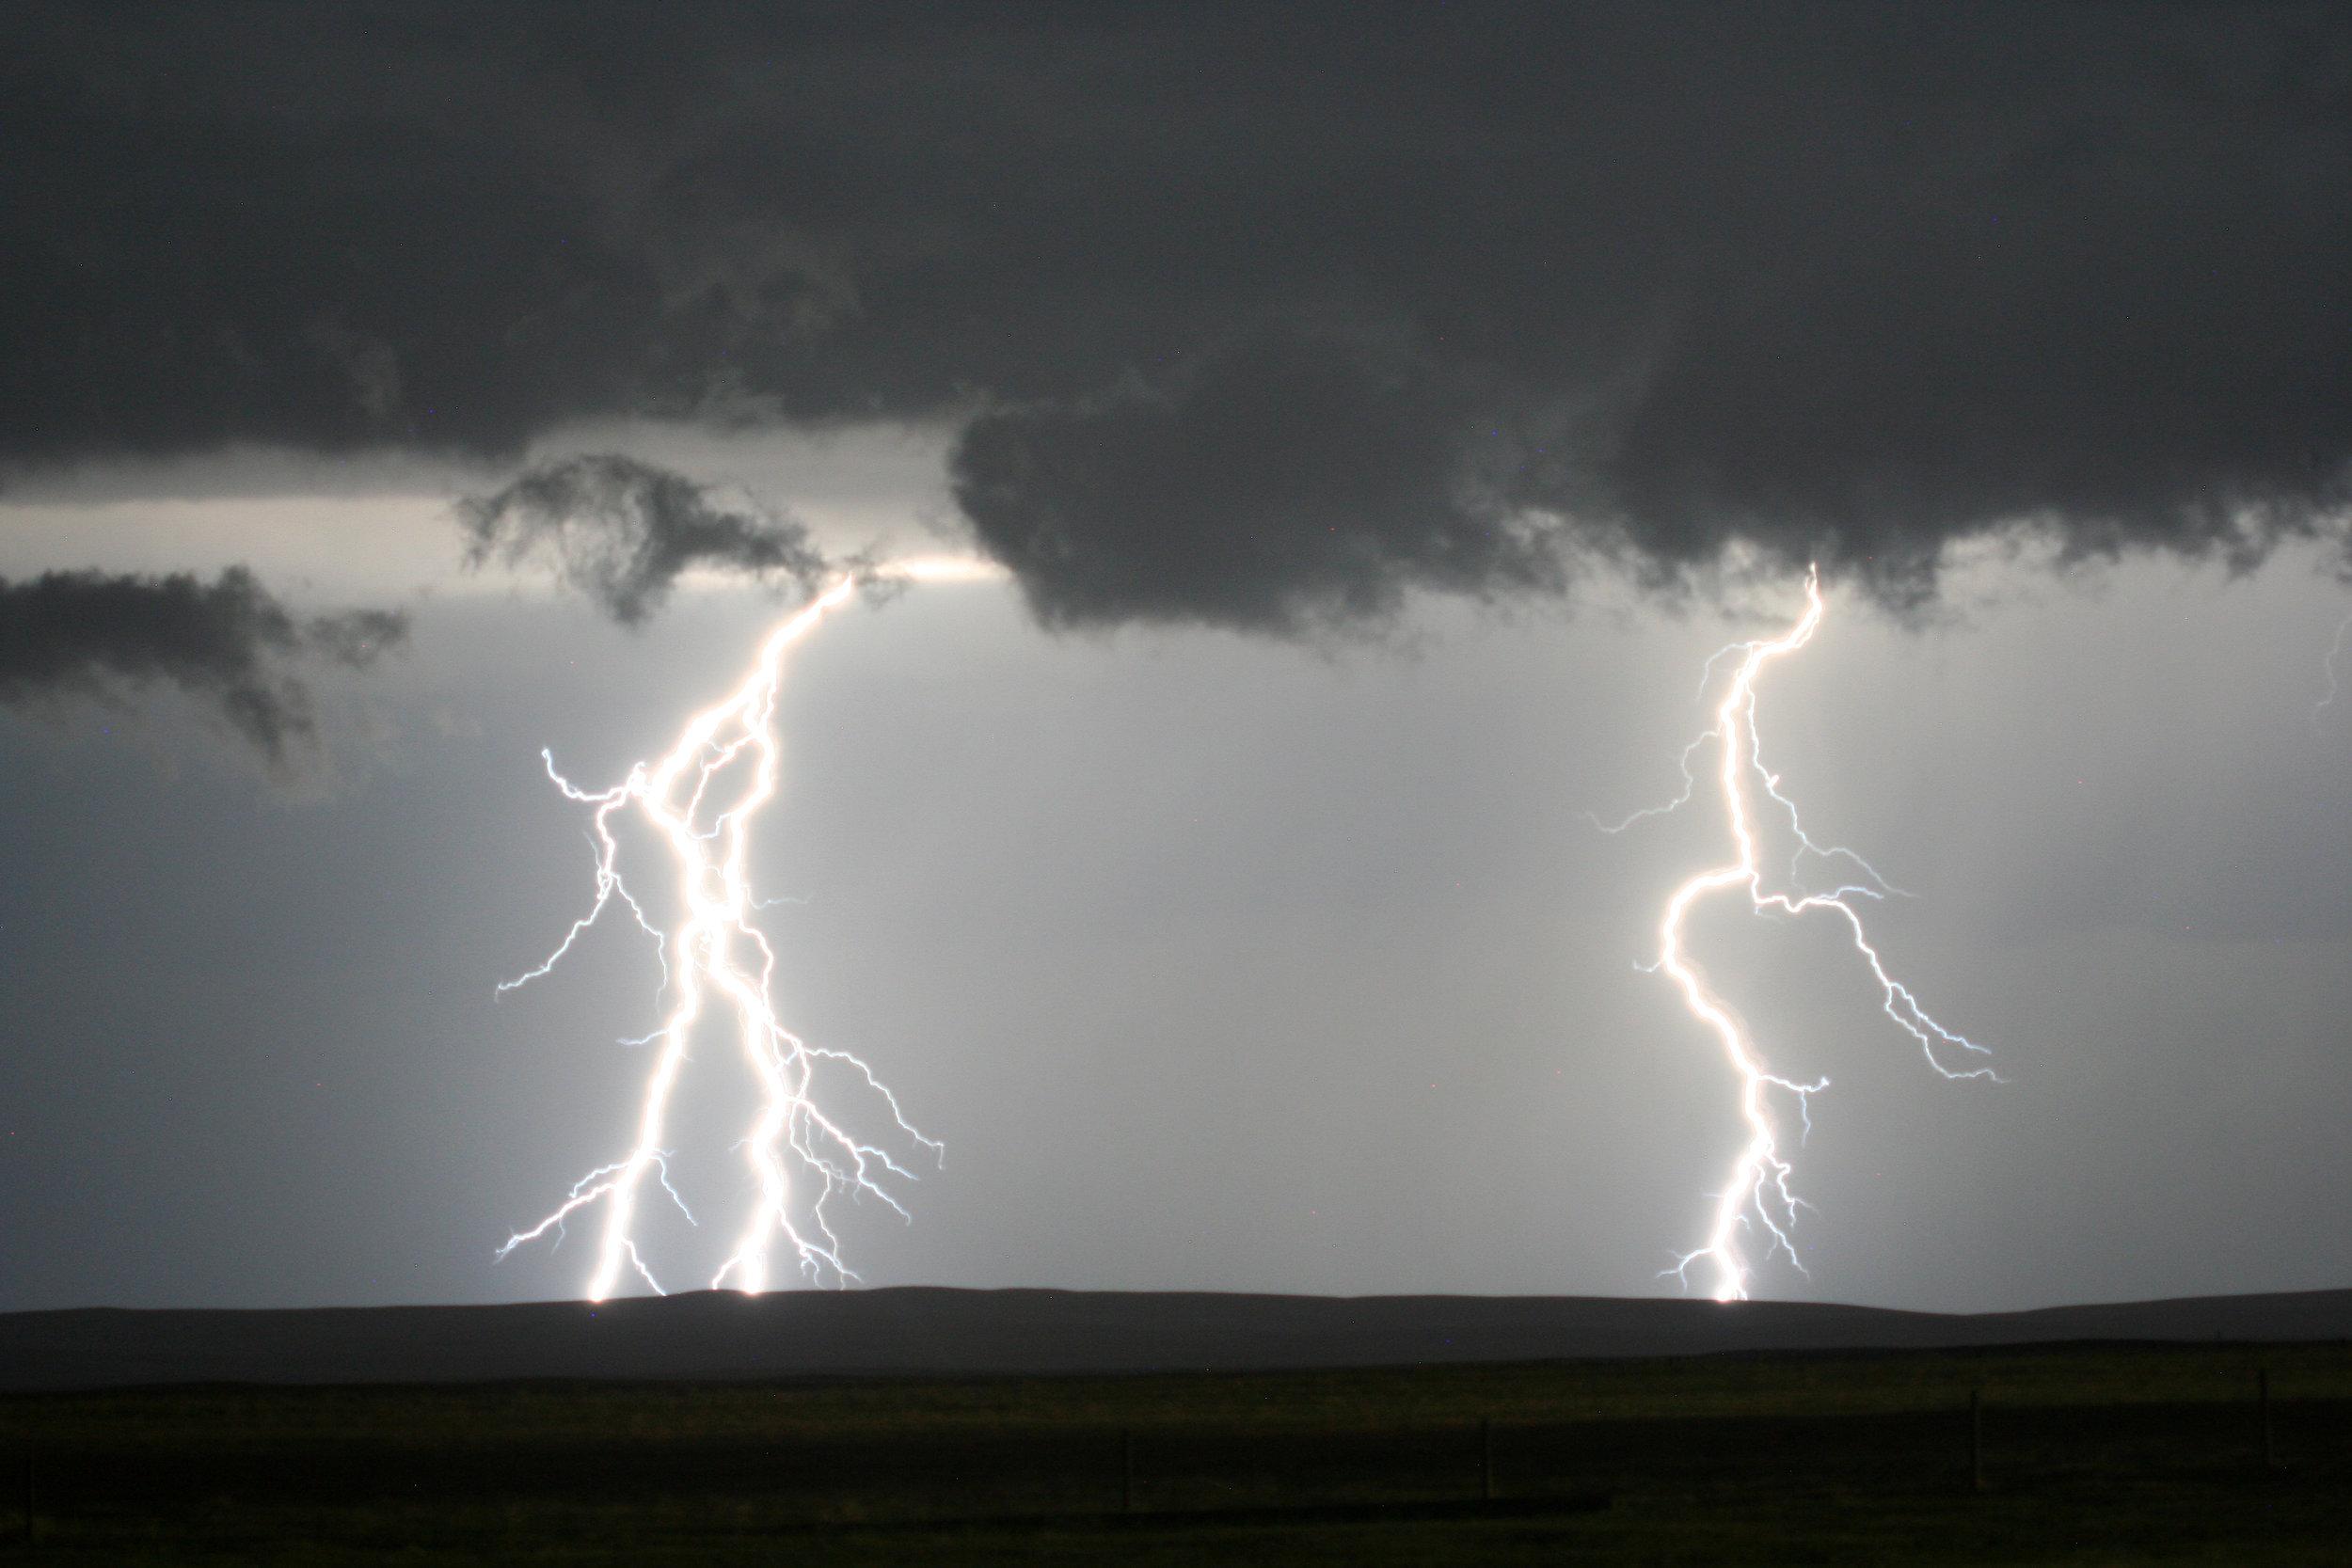 Lightning storm in CFB Suffield, Alberta 2013